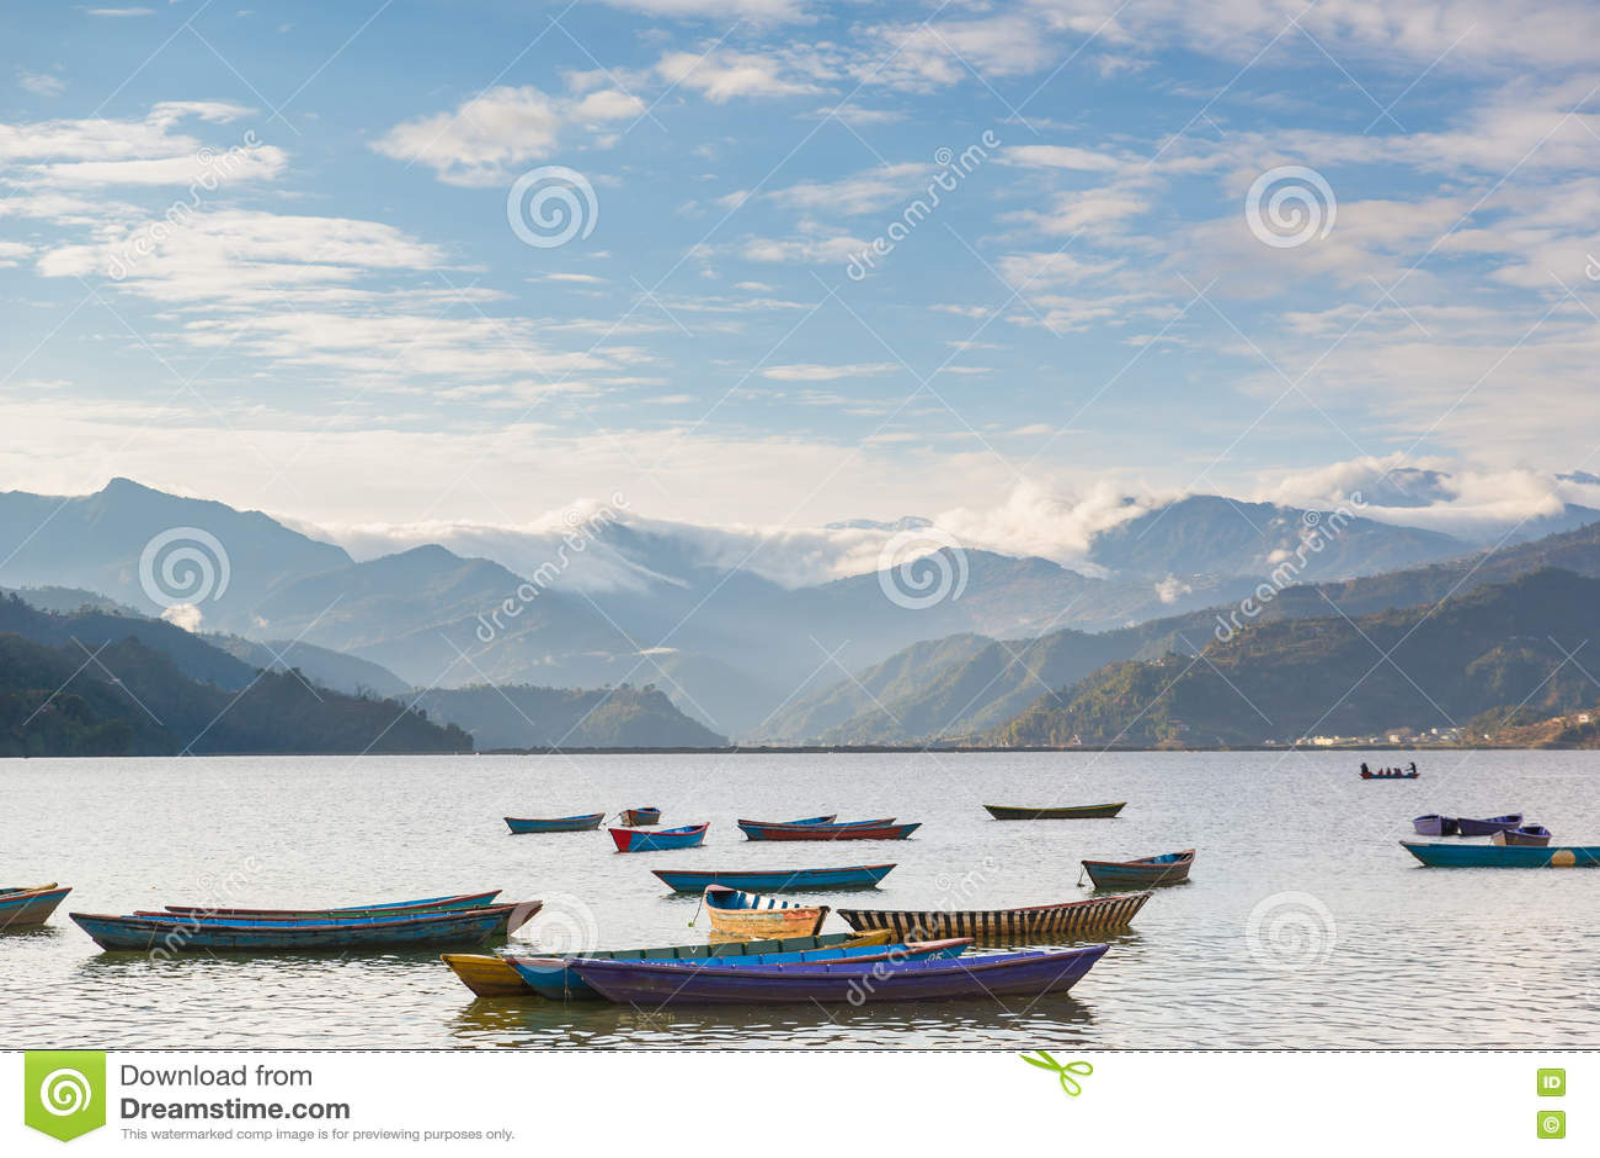 Pokhara summer vacation